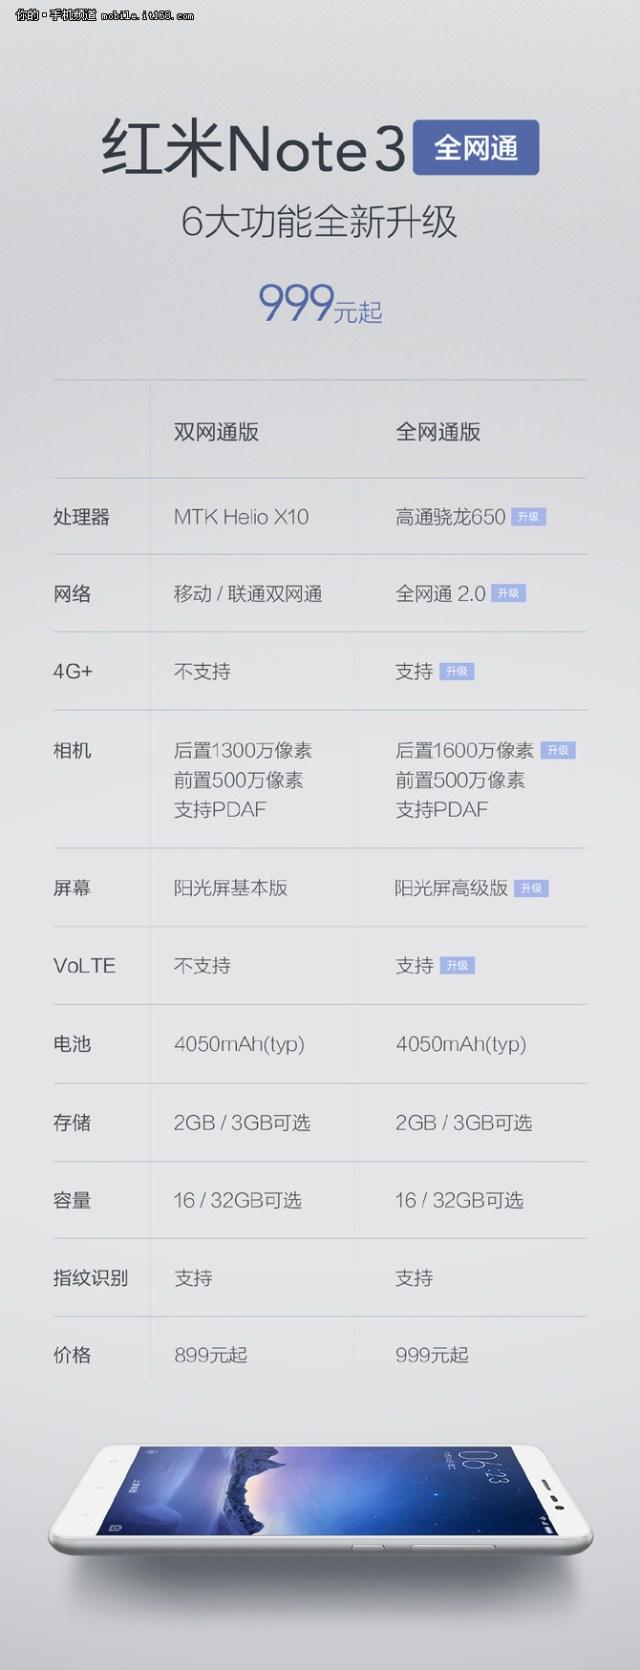 xiaomi-redmi-note-3-both-versions